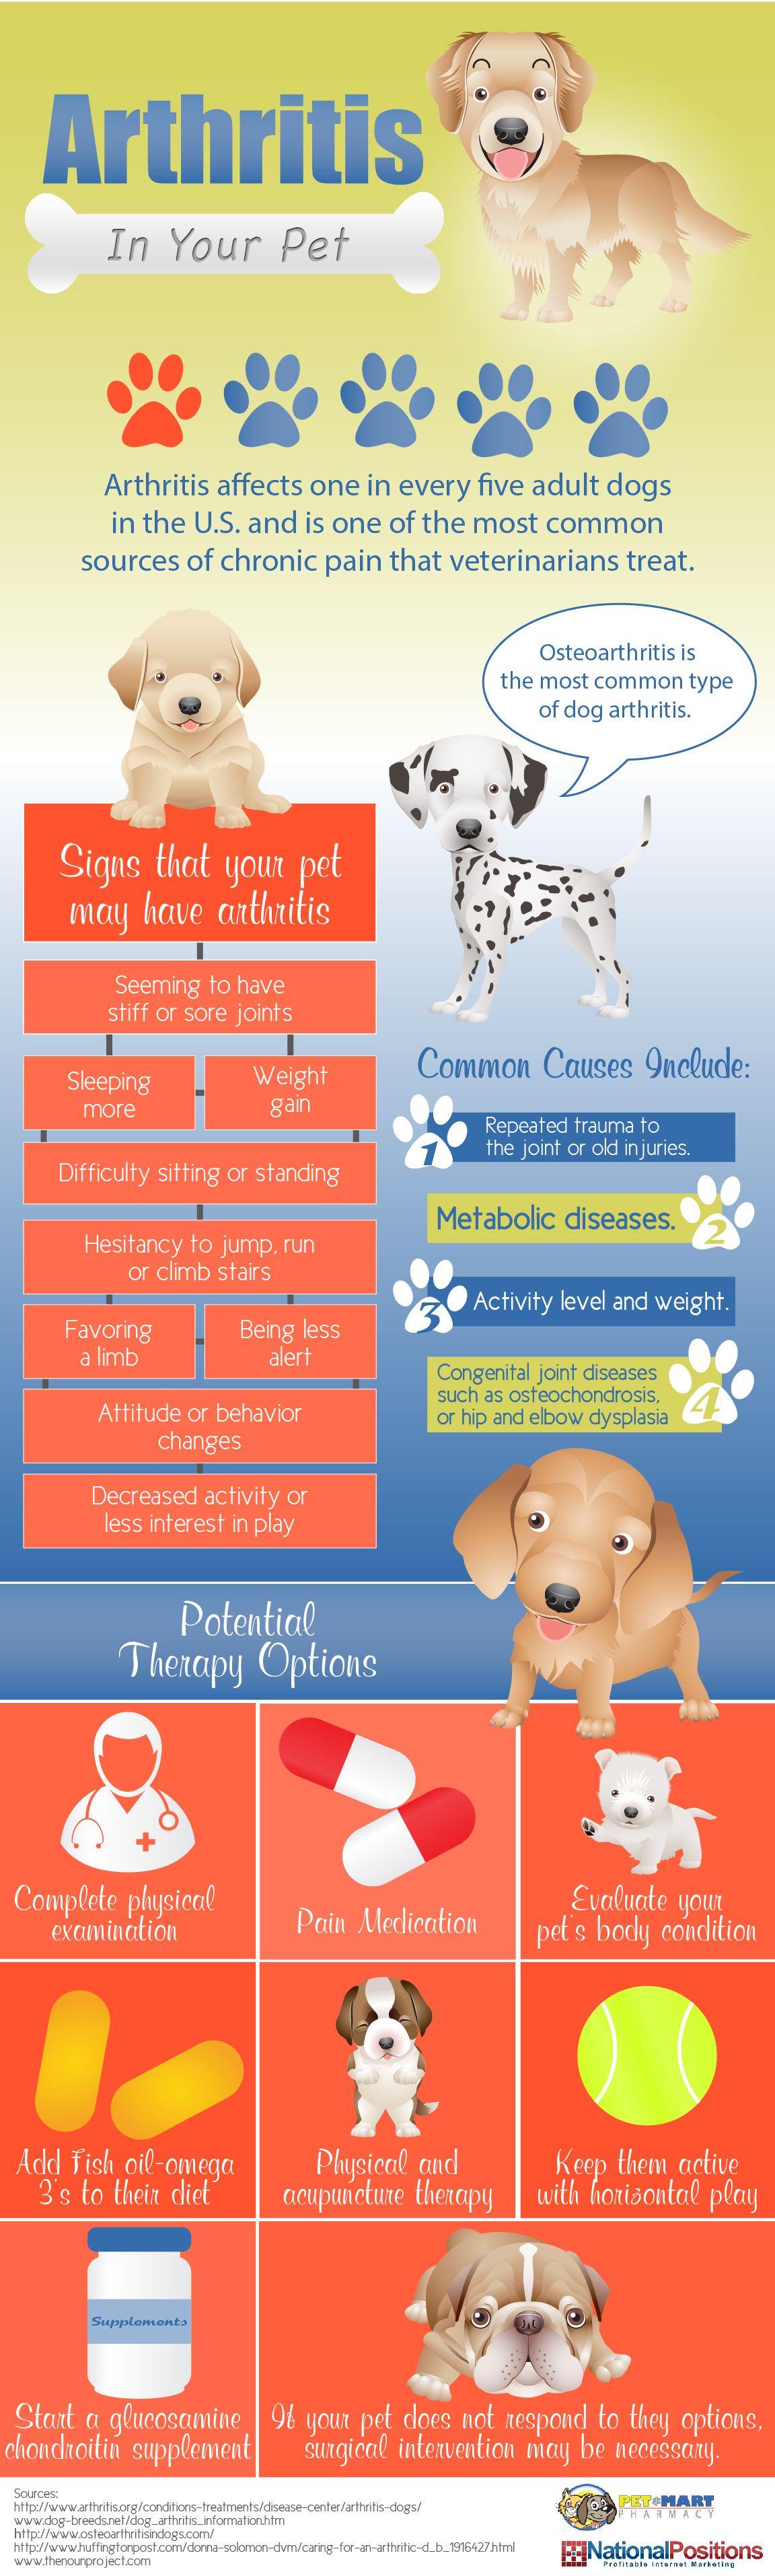 I Missed The Early Signs Of Arthritis In My Dog Puppy Leaks Dog Arthritis Pet Arthritis Canine Arthritis